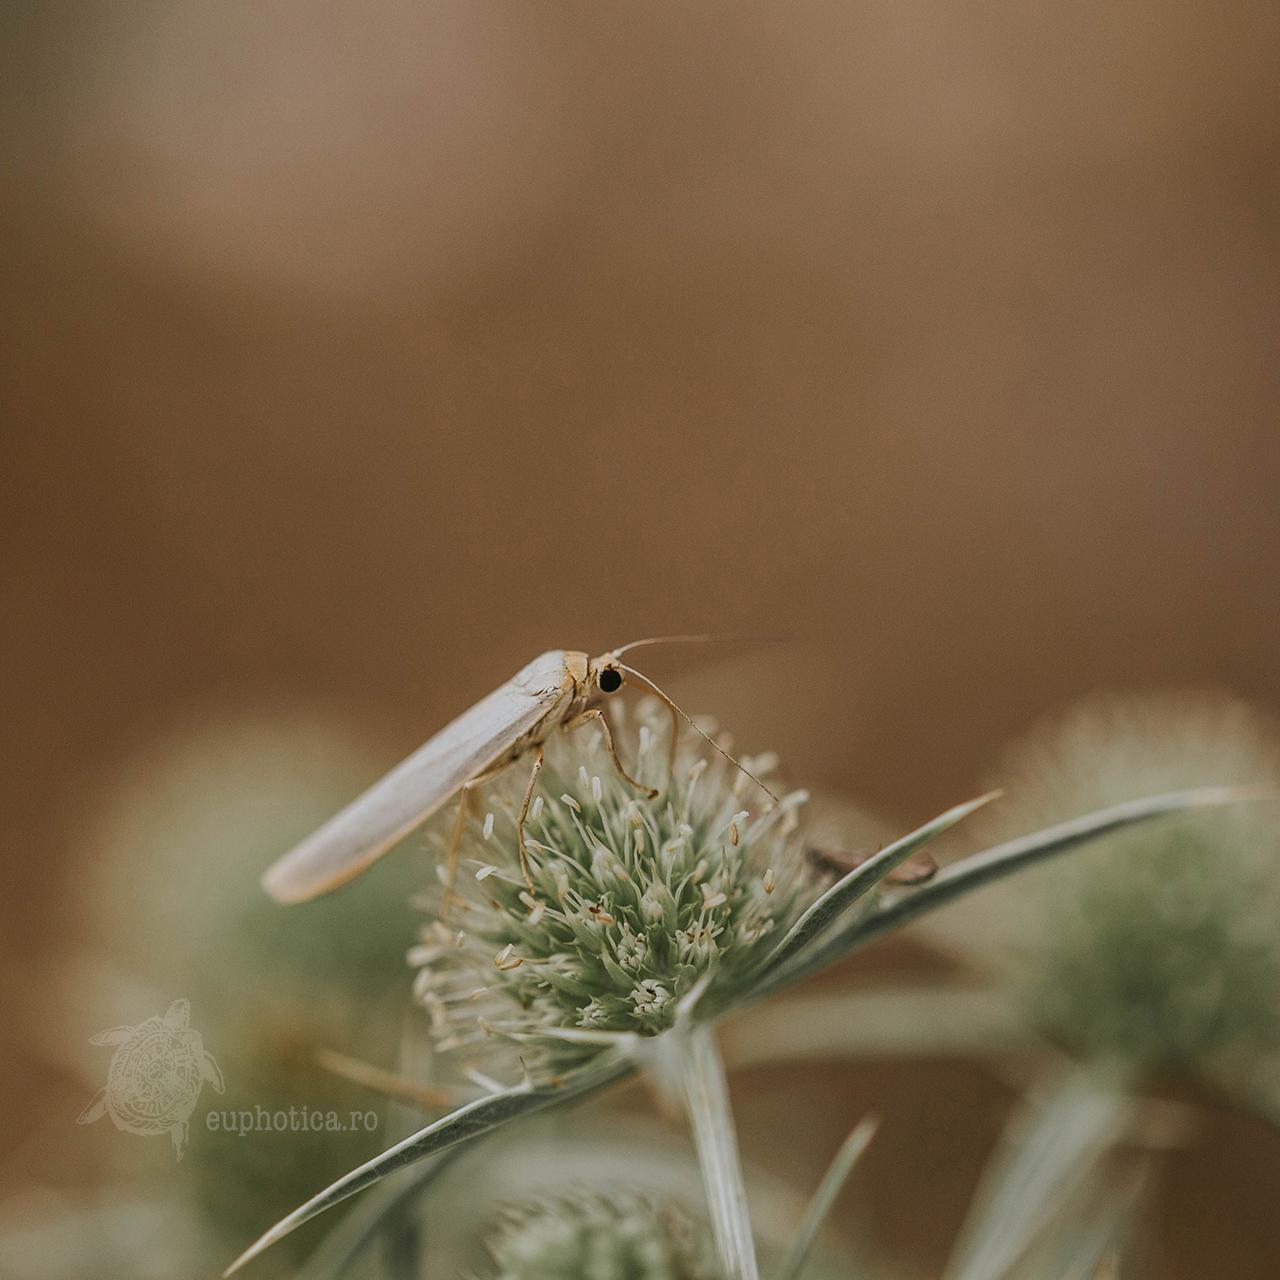 Botanicals and Bugs